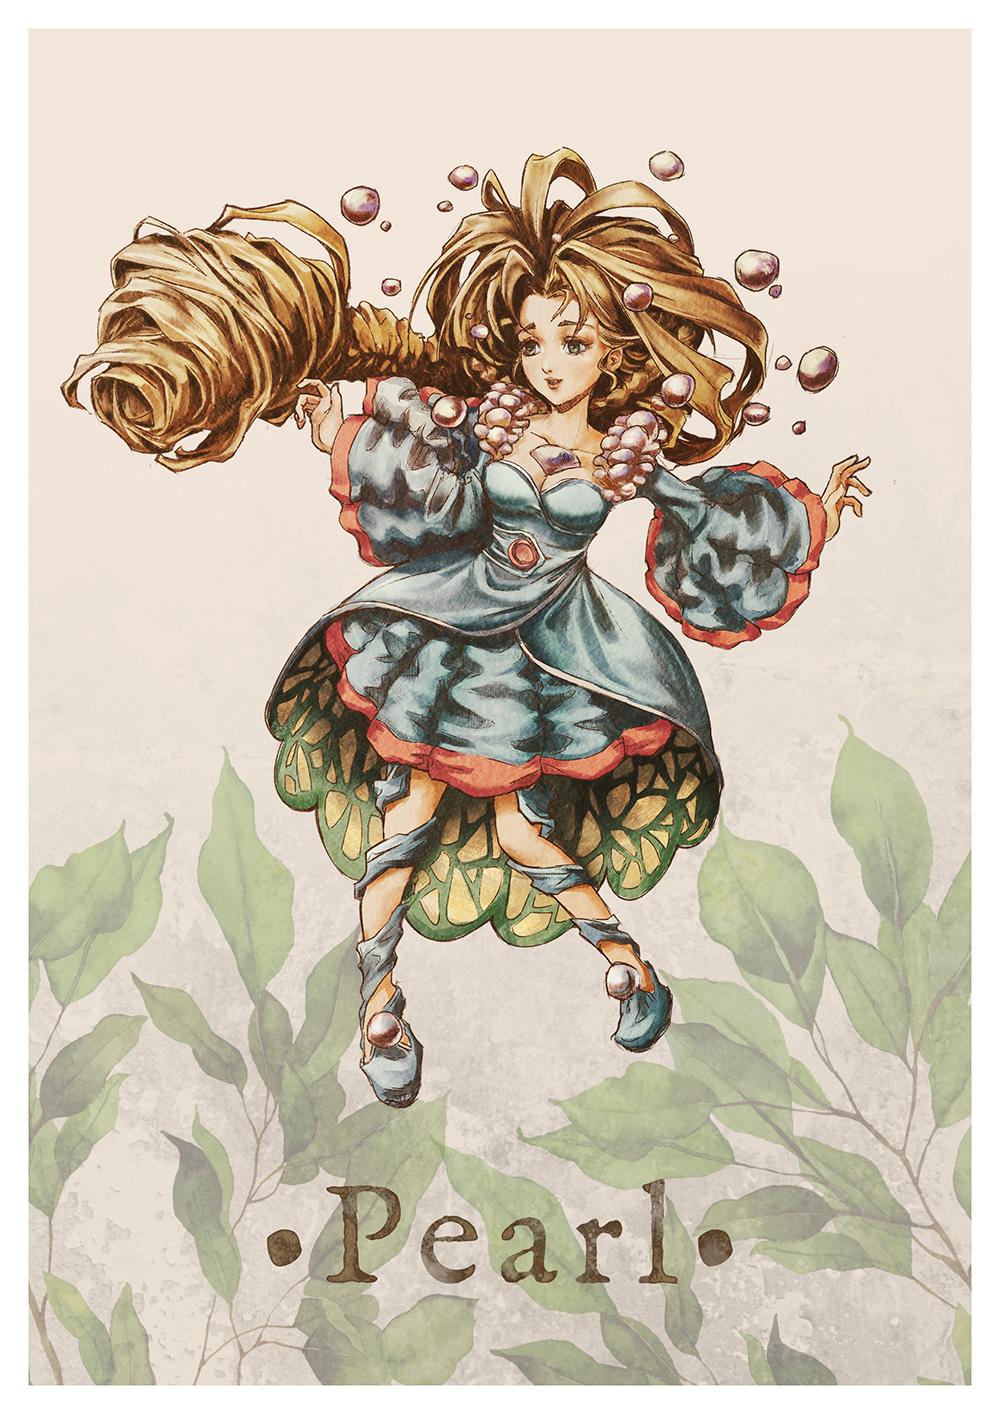 Paola Tuazon - 聖剣伝説 Seiken Densetsu: Legend of Mana - 真珠姫 Jumi Guardian Pearl Fanart